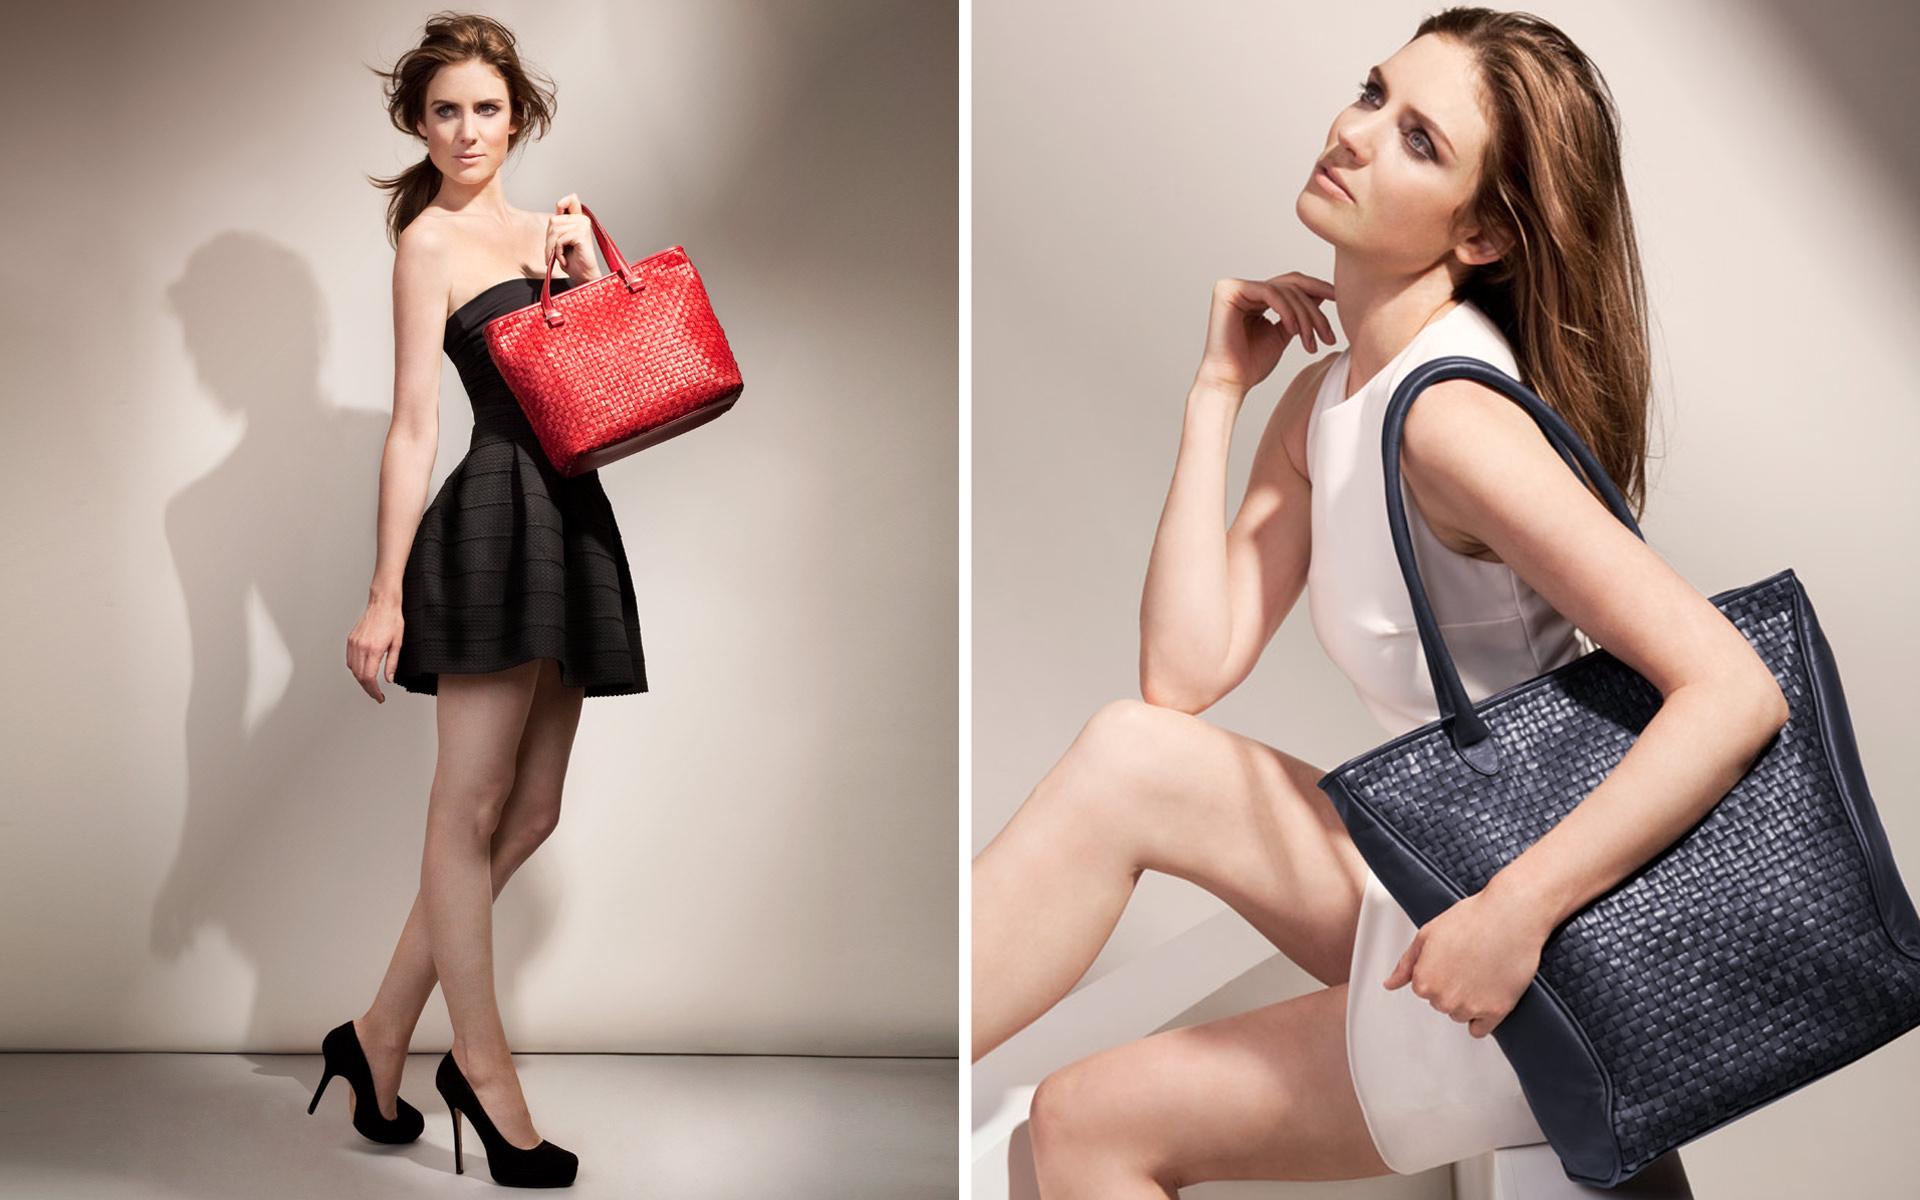 058_Fashion_F.Roncaldier